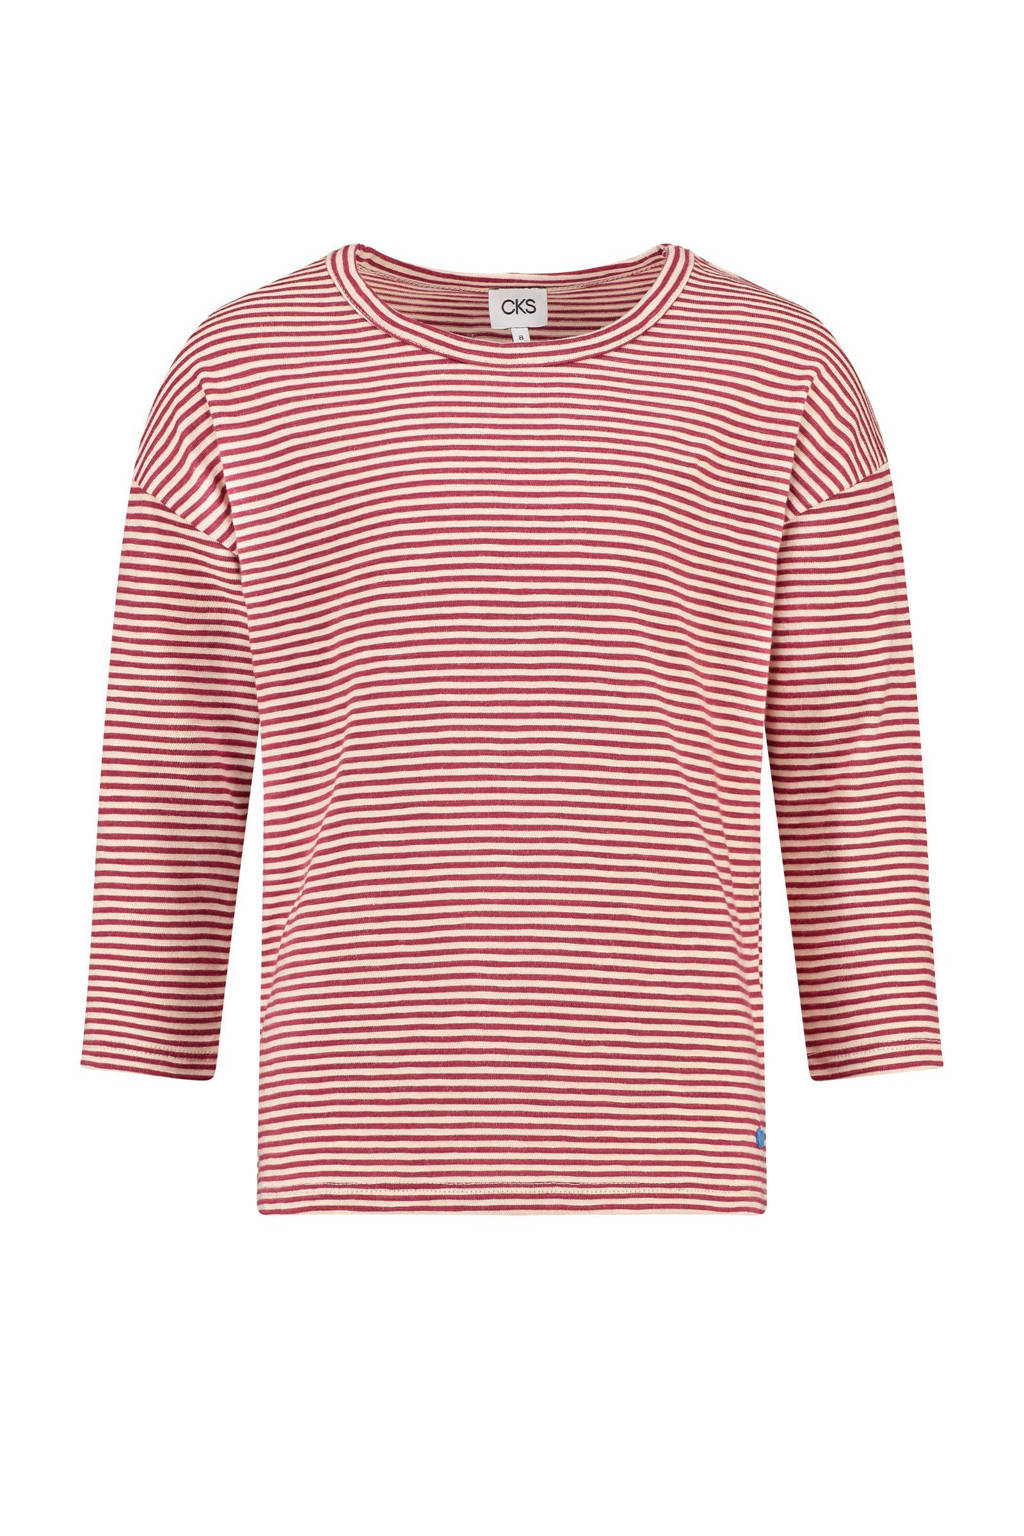 CKS KIDS gestreept T-shirt Greet rood/wit, Rood/wit